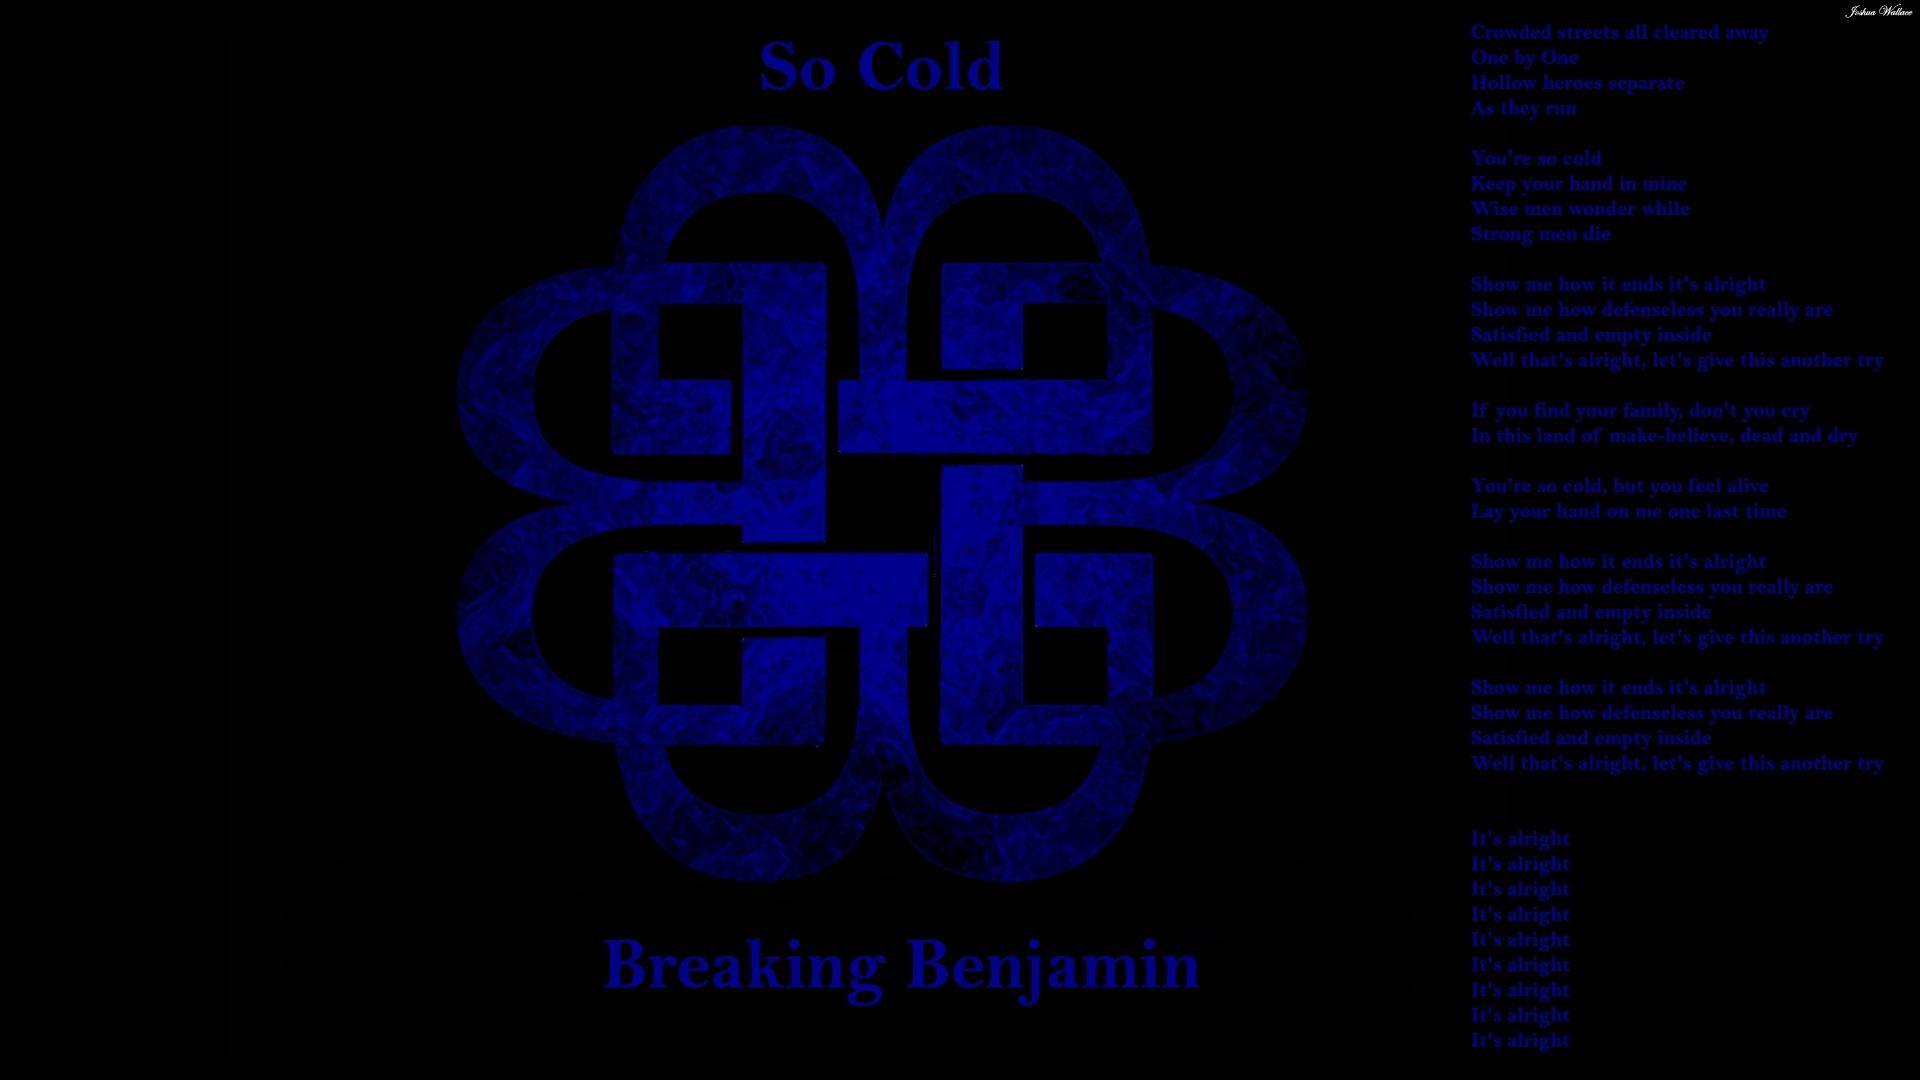 Benjamin Black Breaking Benjamin Wallpaper Wallpapers Download 1920x1080